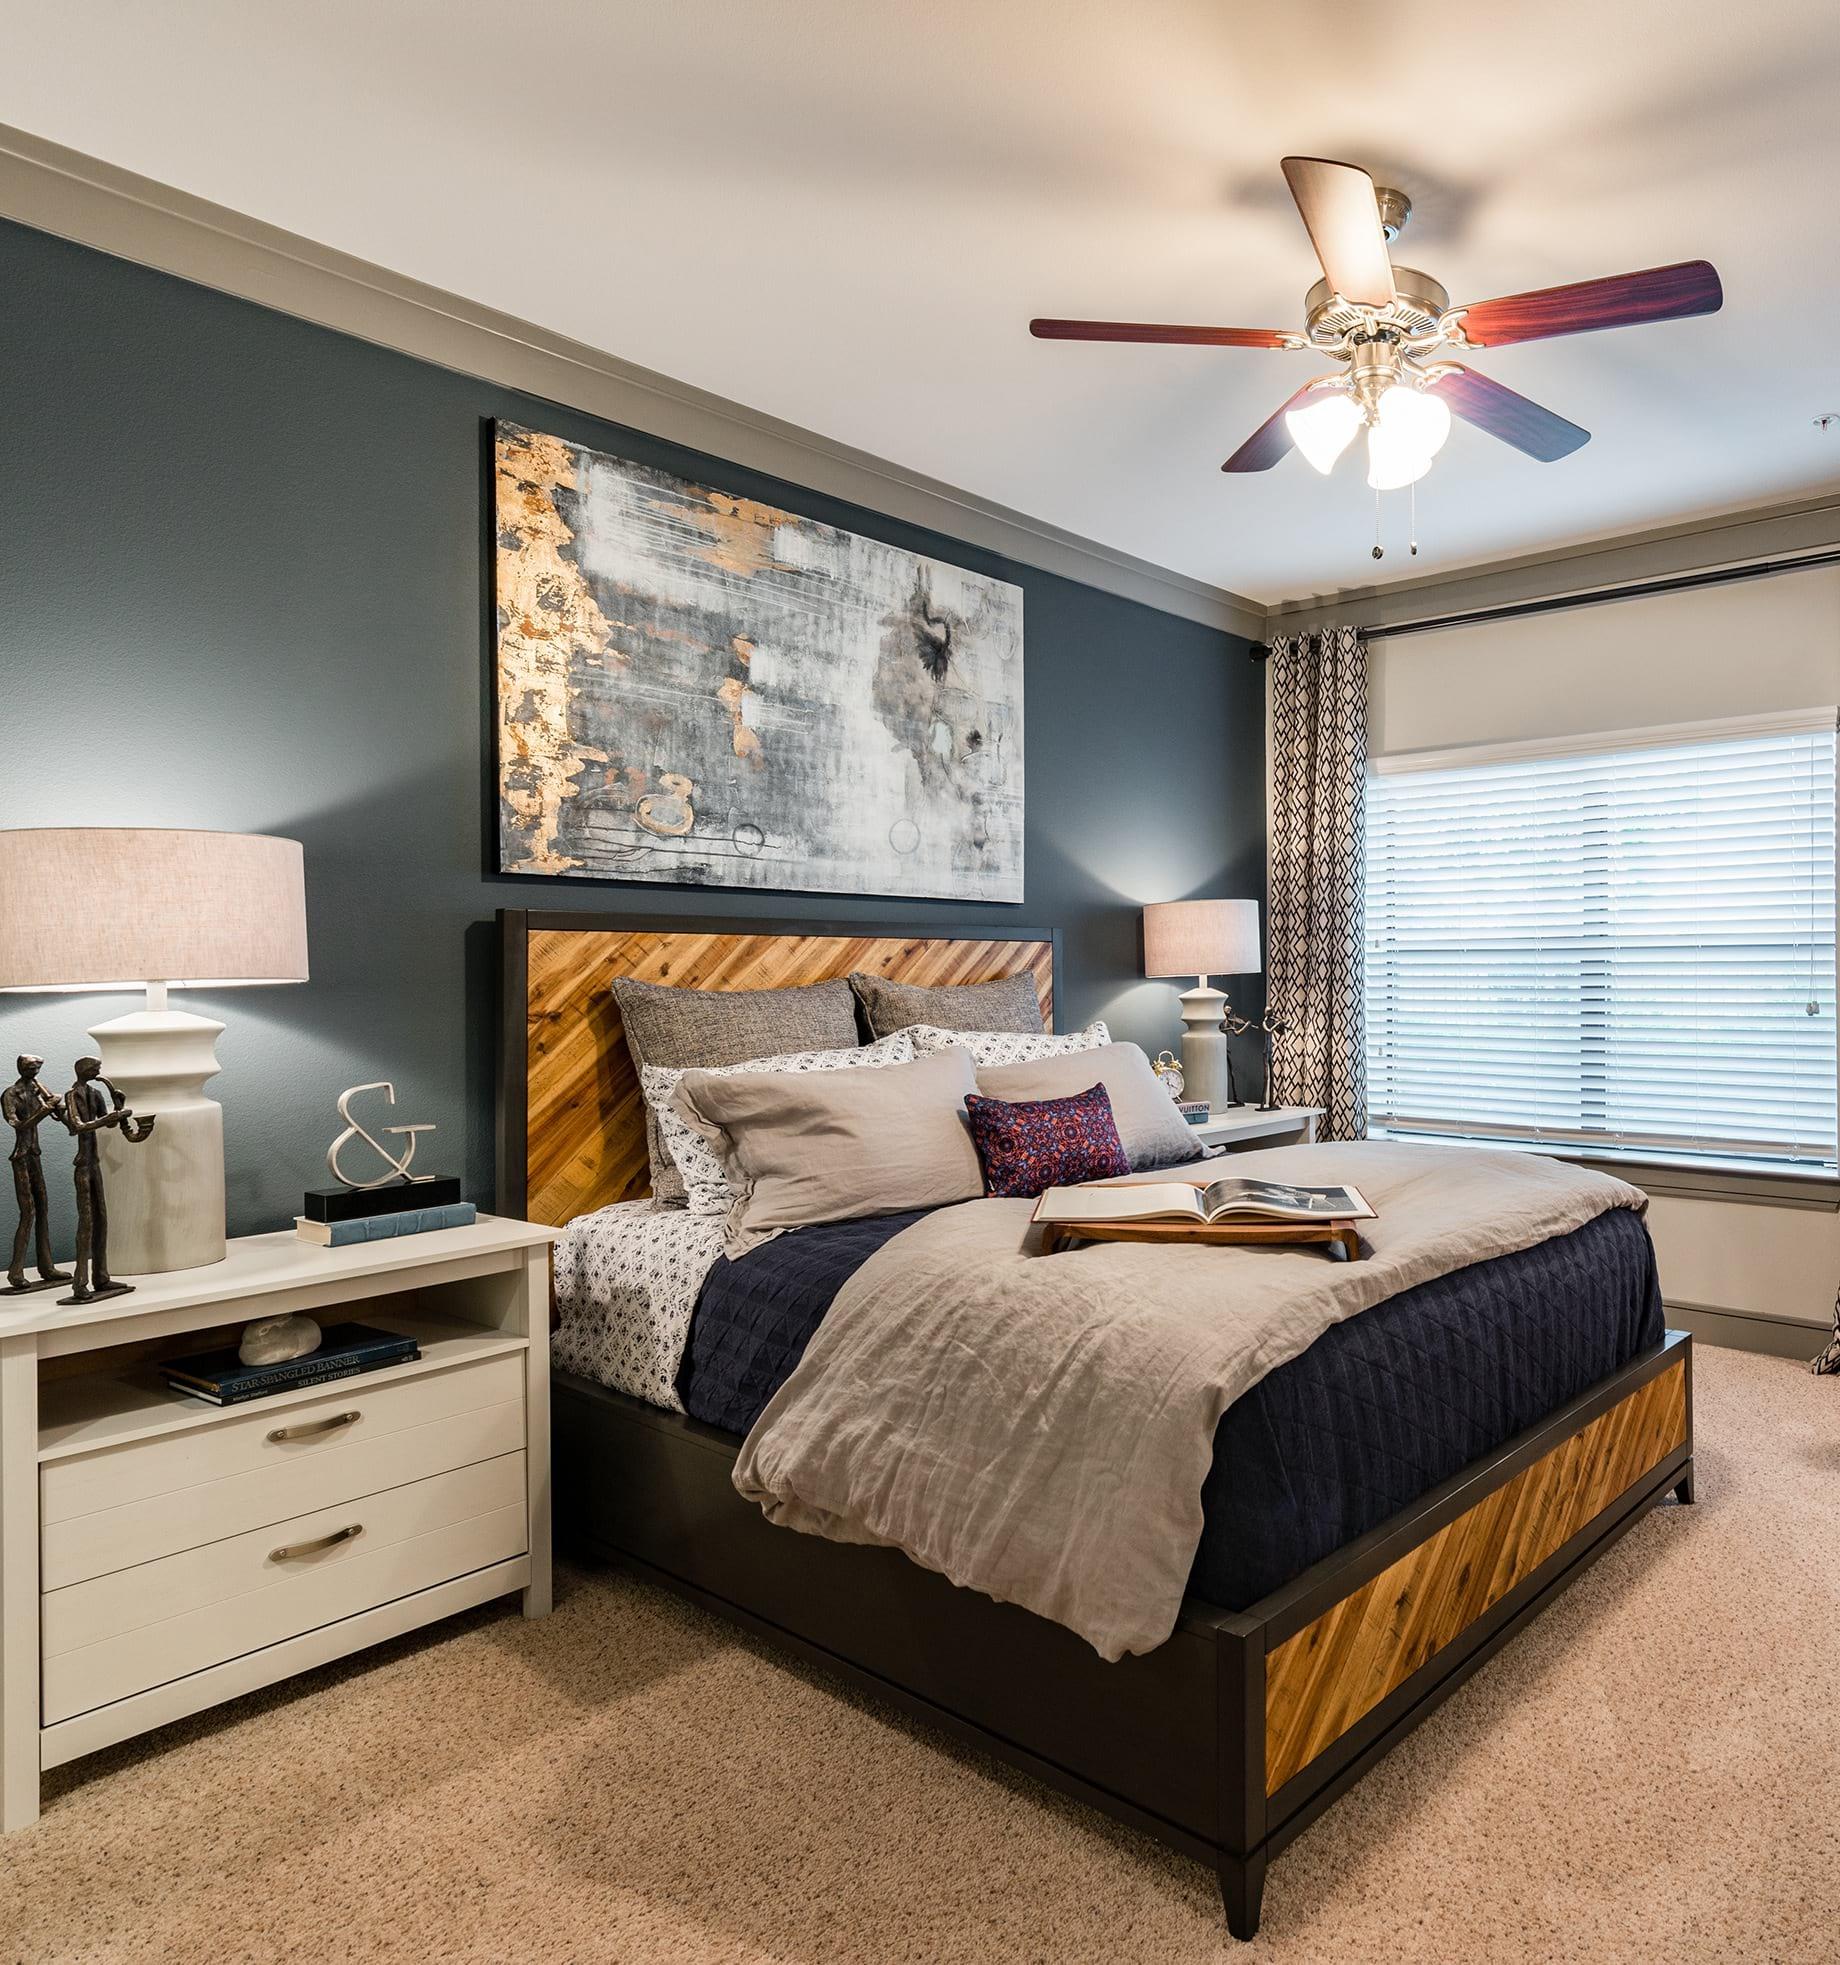 Apartments Katy Tx: Apartments In Katy, TX